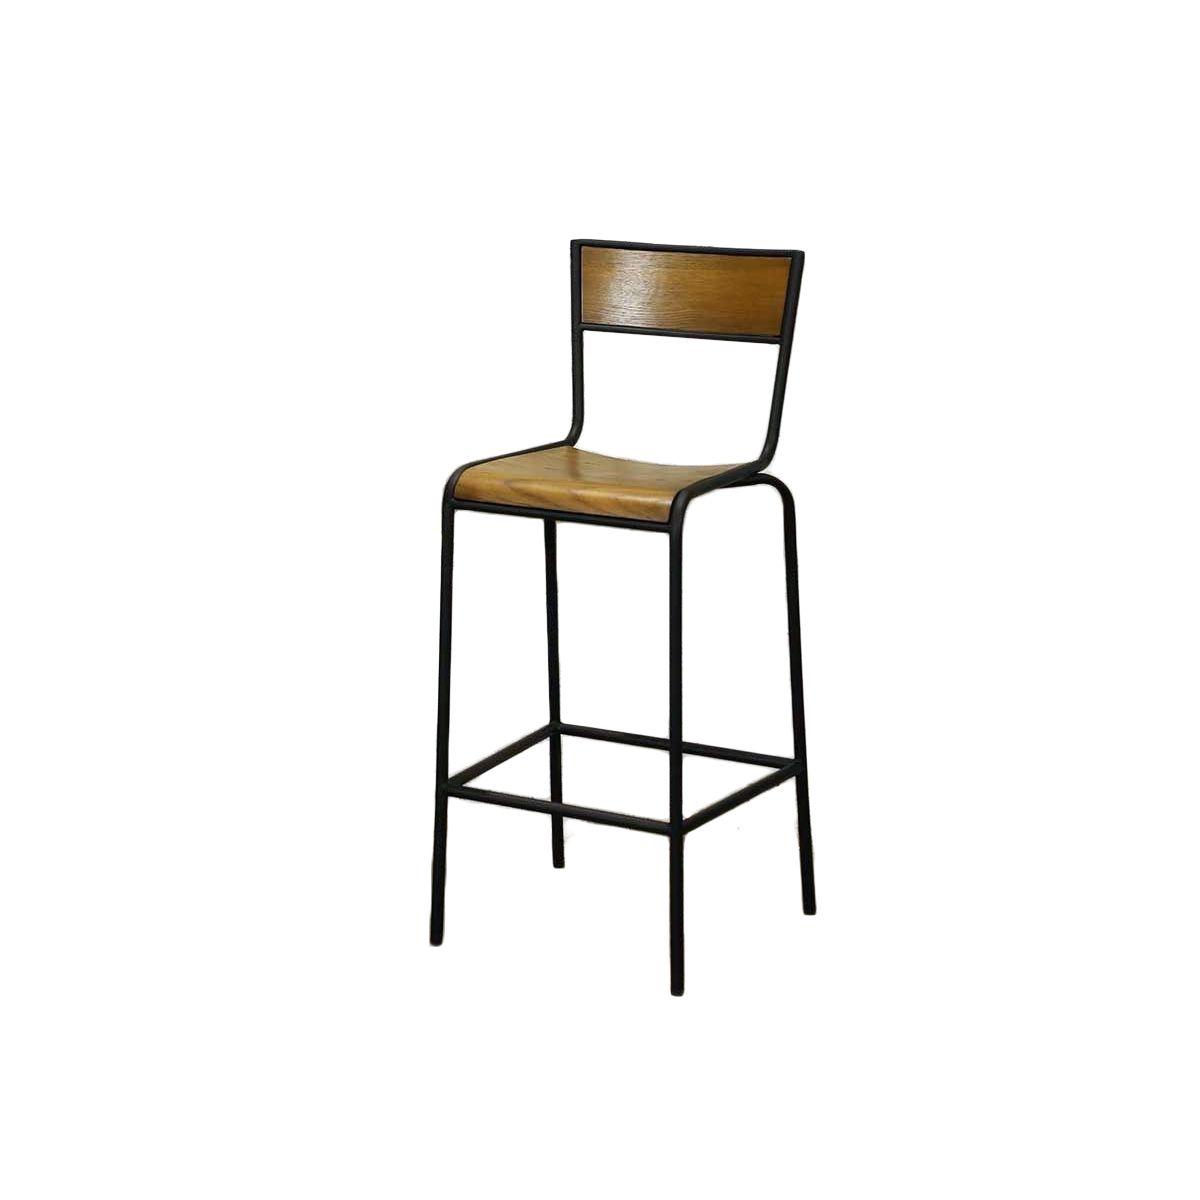 Chaise bar métal contreplaqué marron